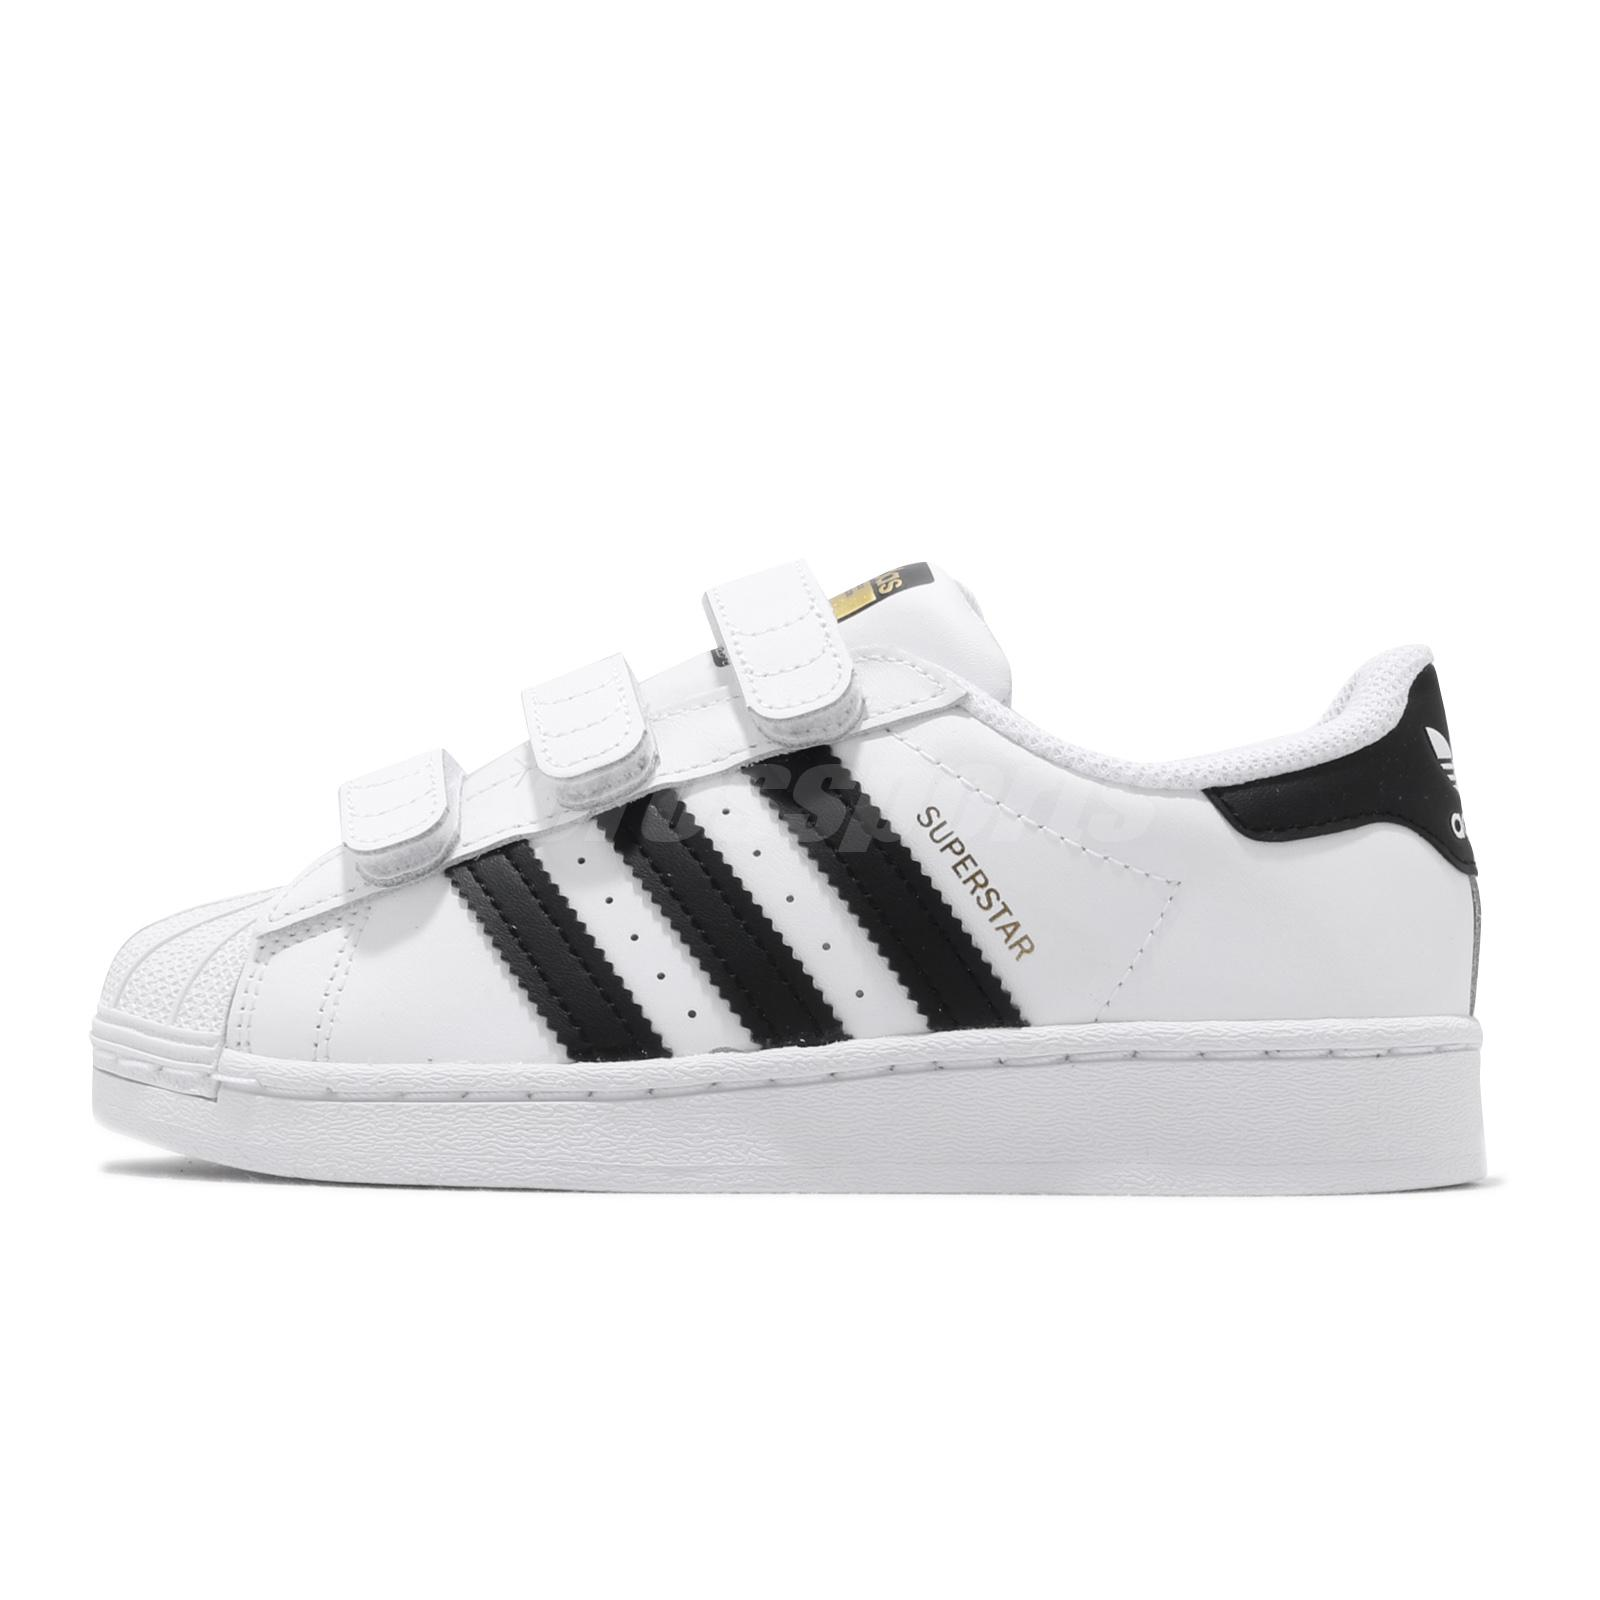 adidas Originals Superstar CF C White Black Preschool Kids Casual ...